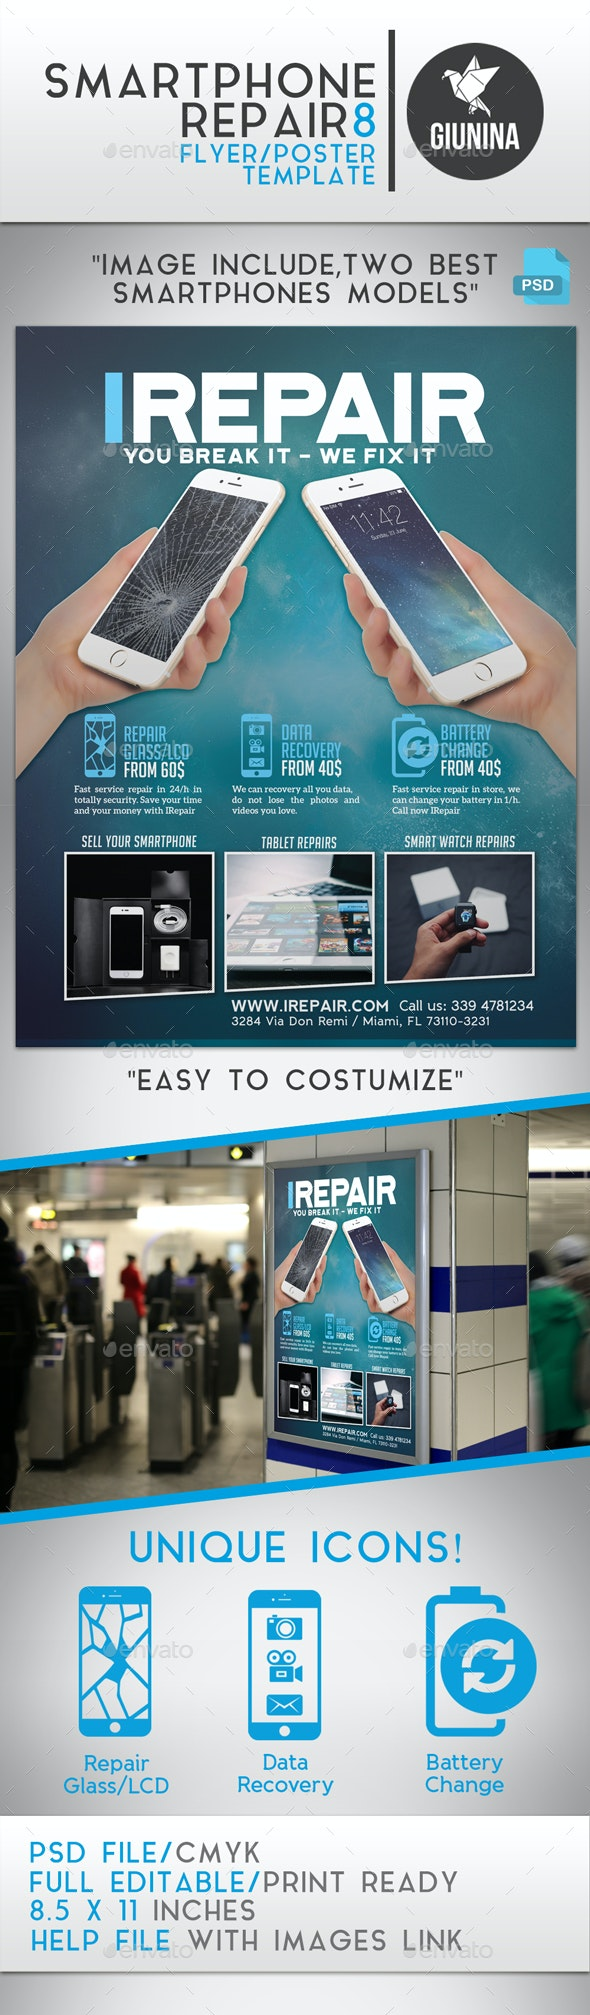 Smartphone Repair 8 Flyer/Poster - Commerce Flyers